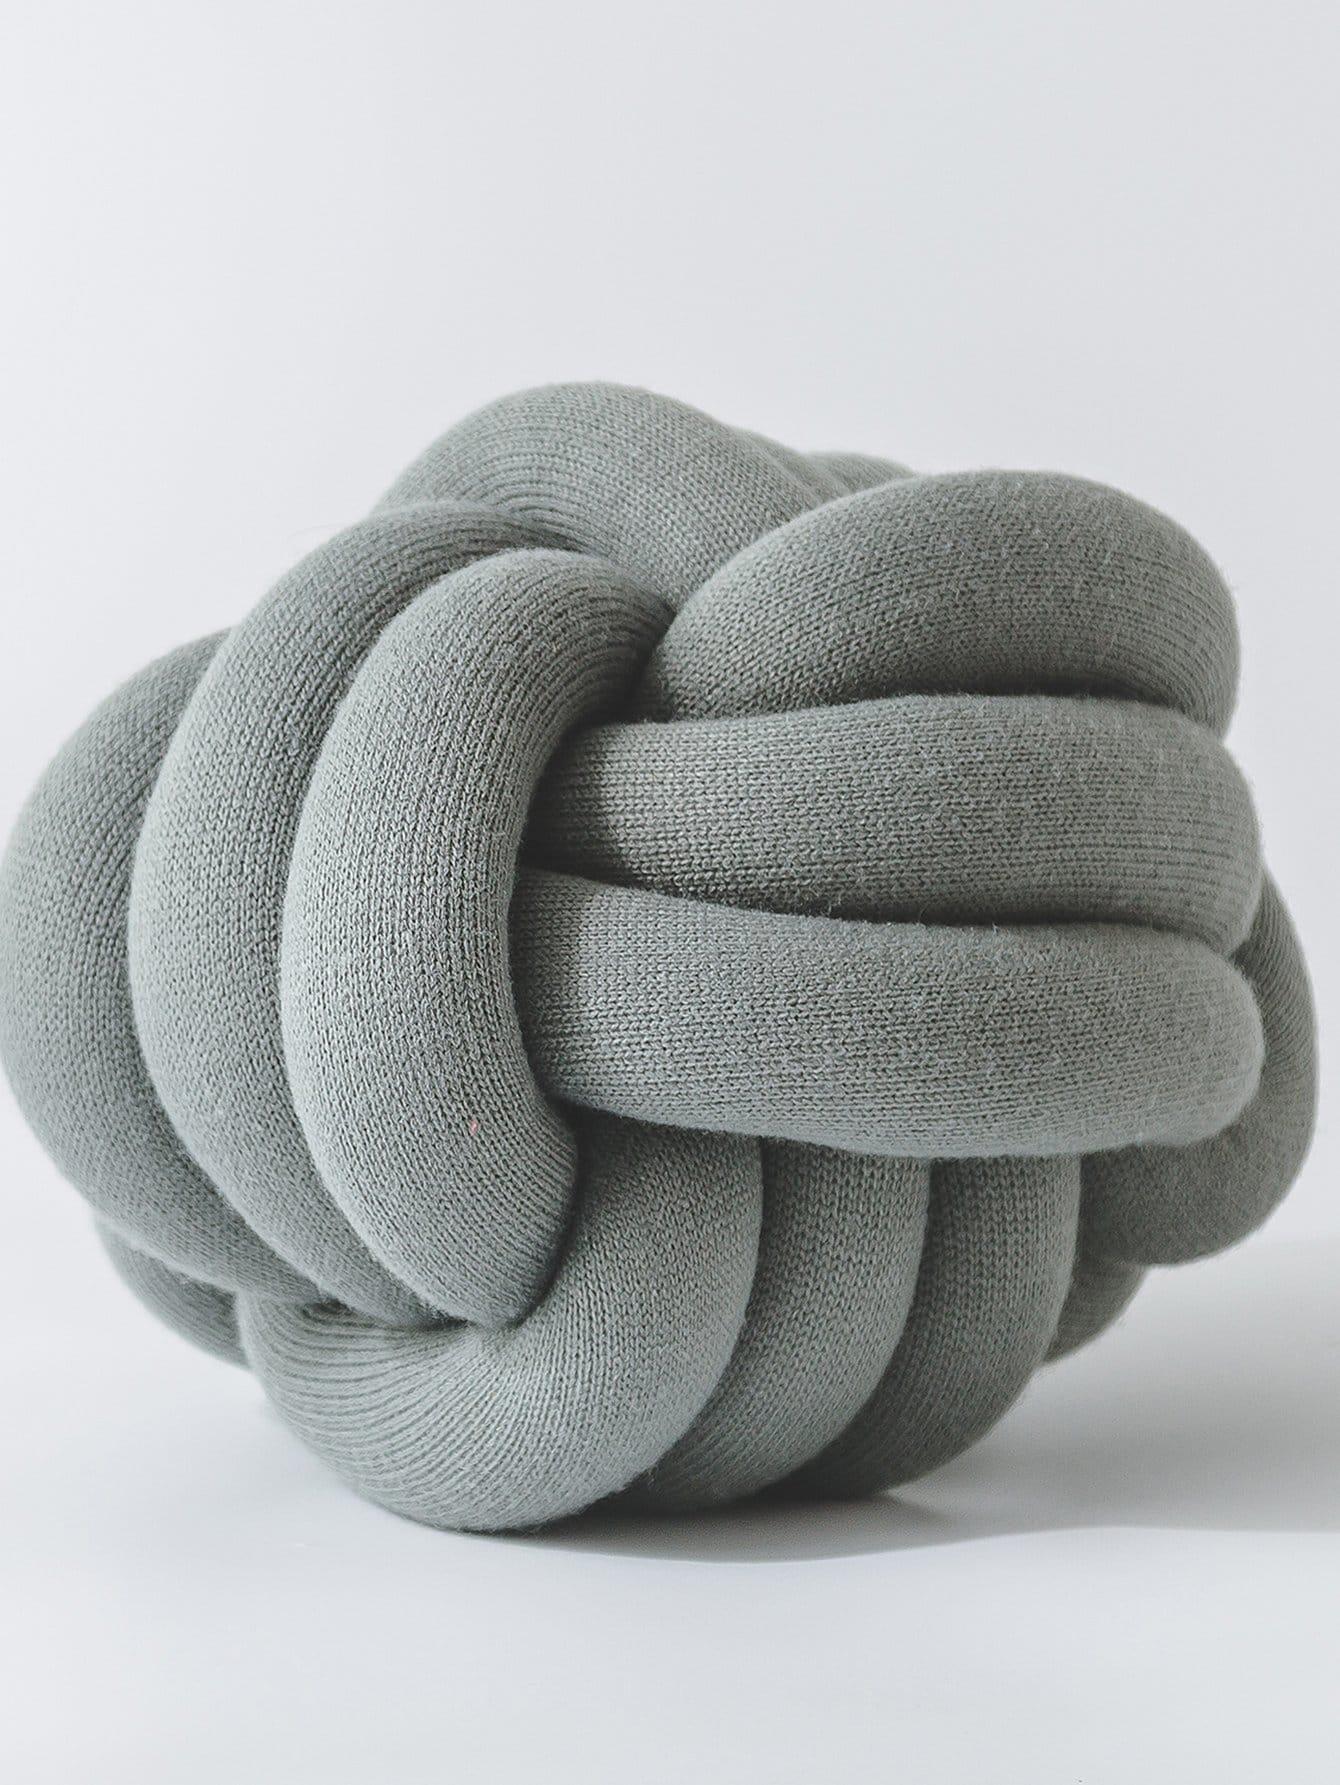 Купить Круглая круглая подушка, null, SheIn